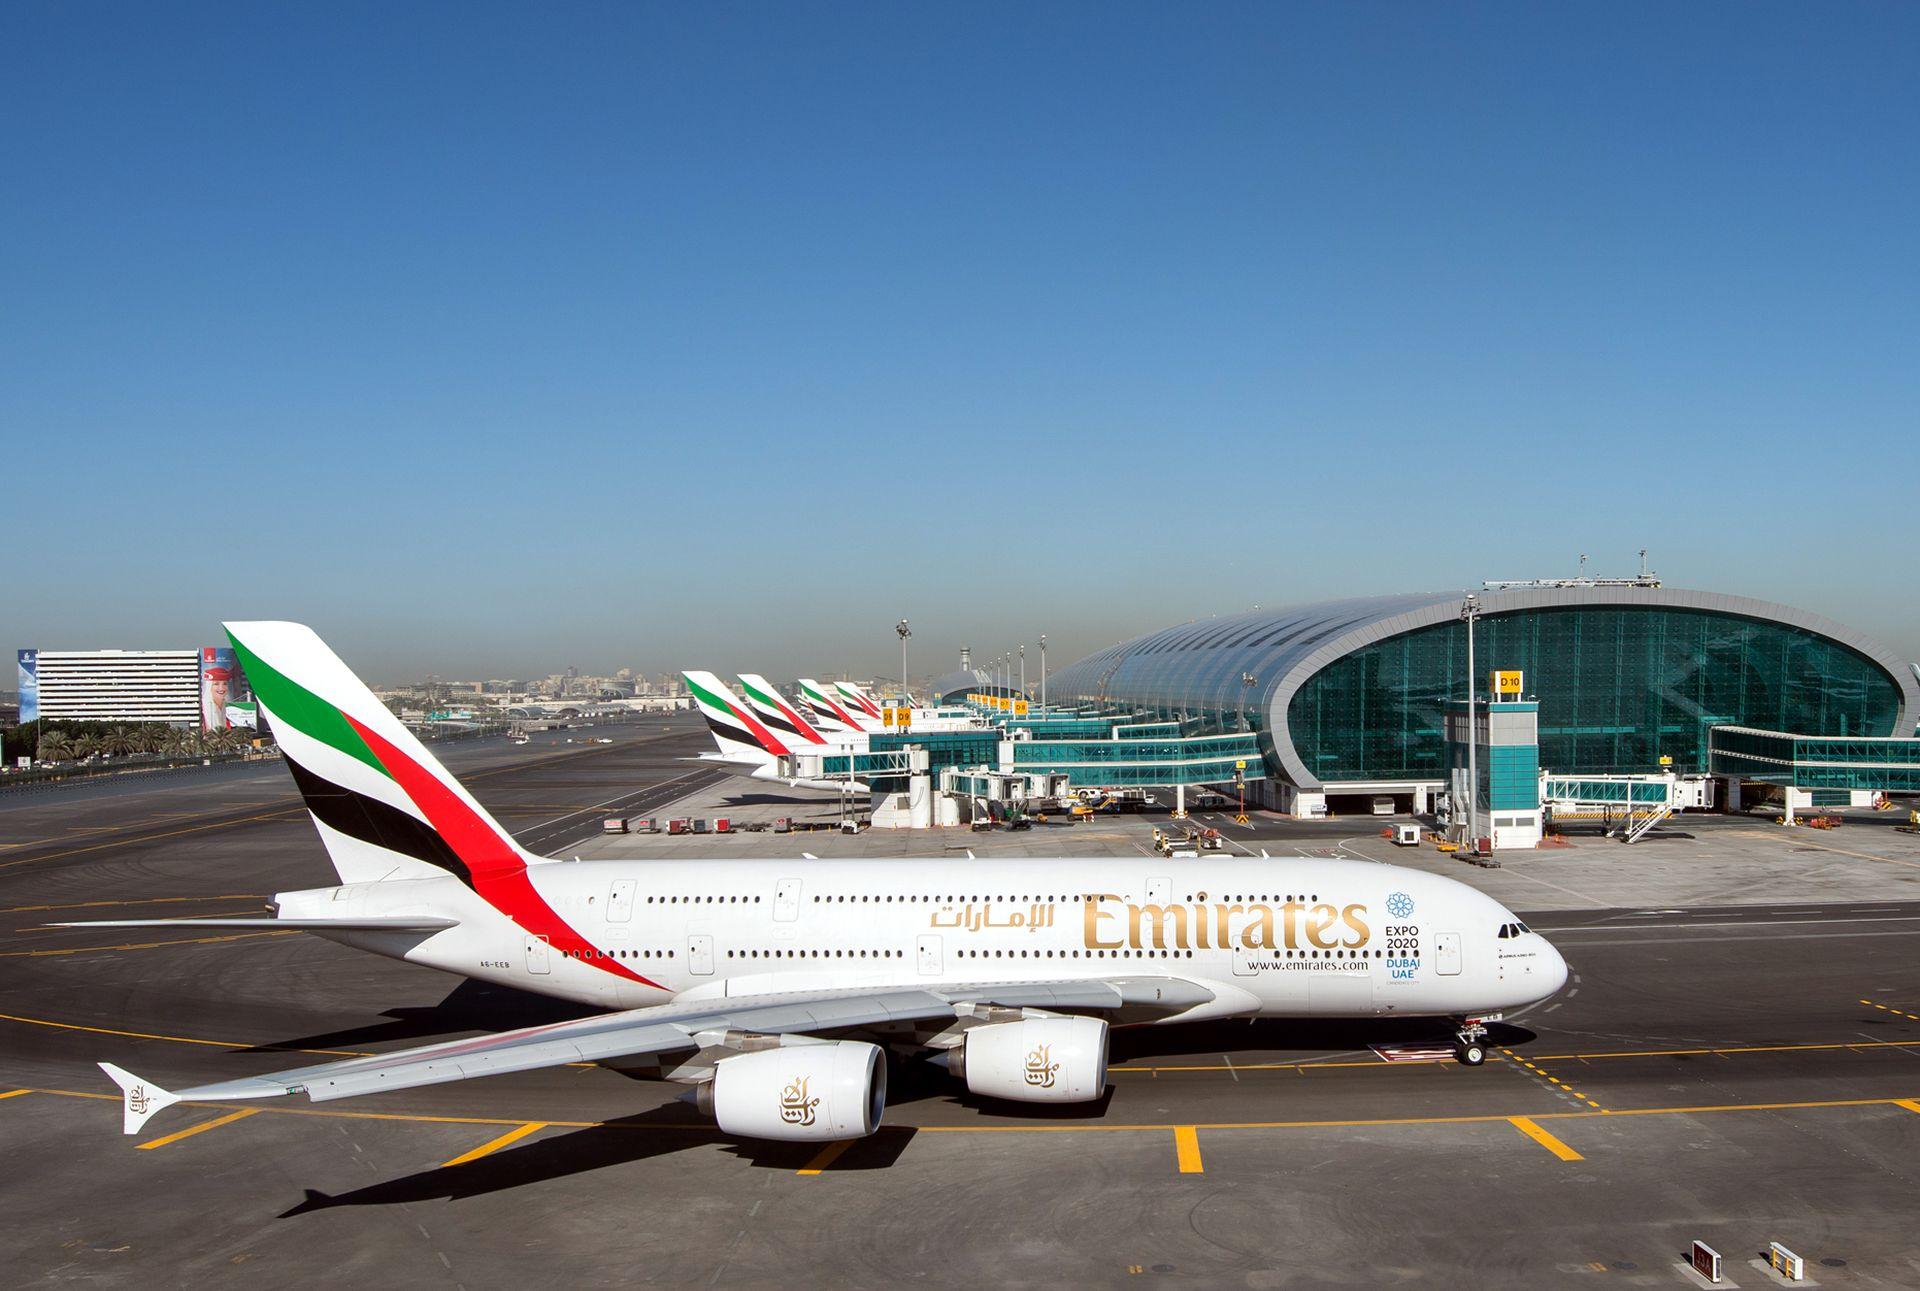 A380 společnosti Emirates v Dubaji. Foto: Emirates